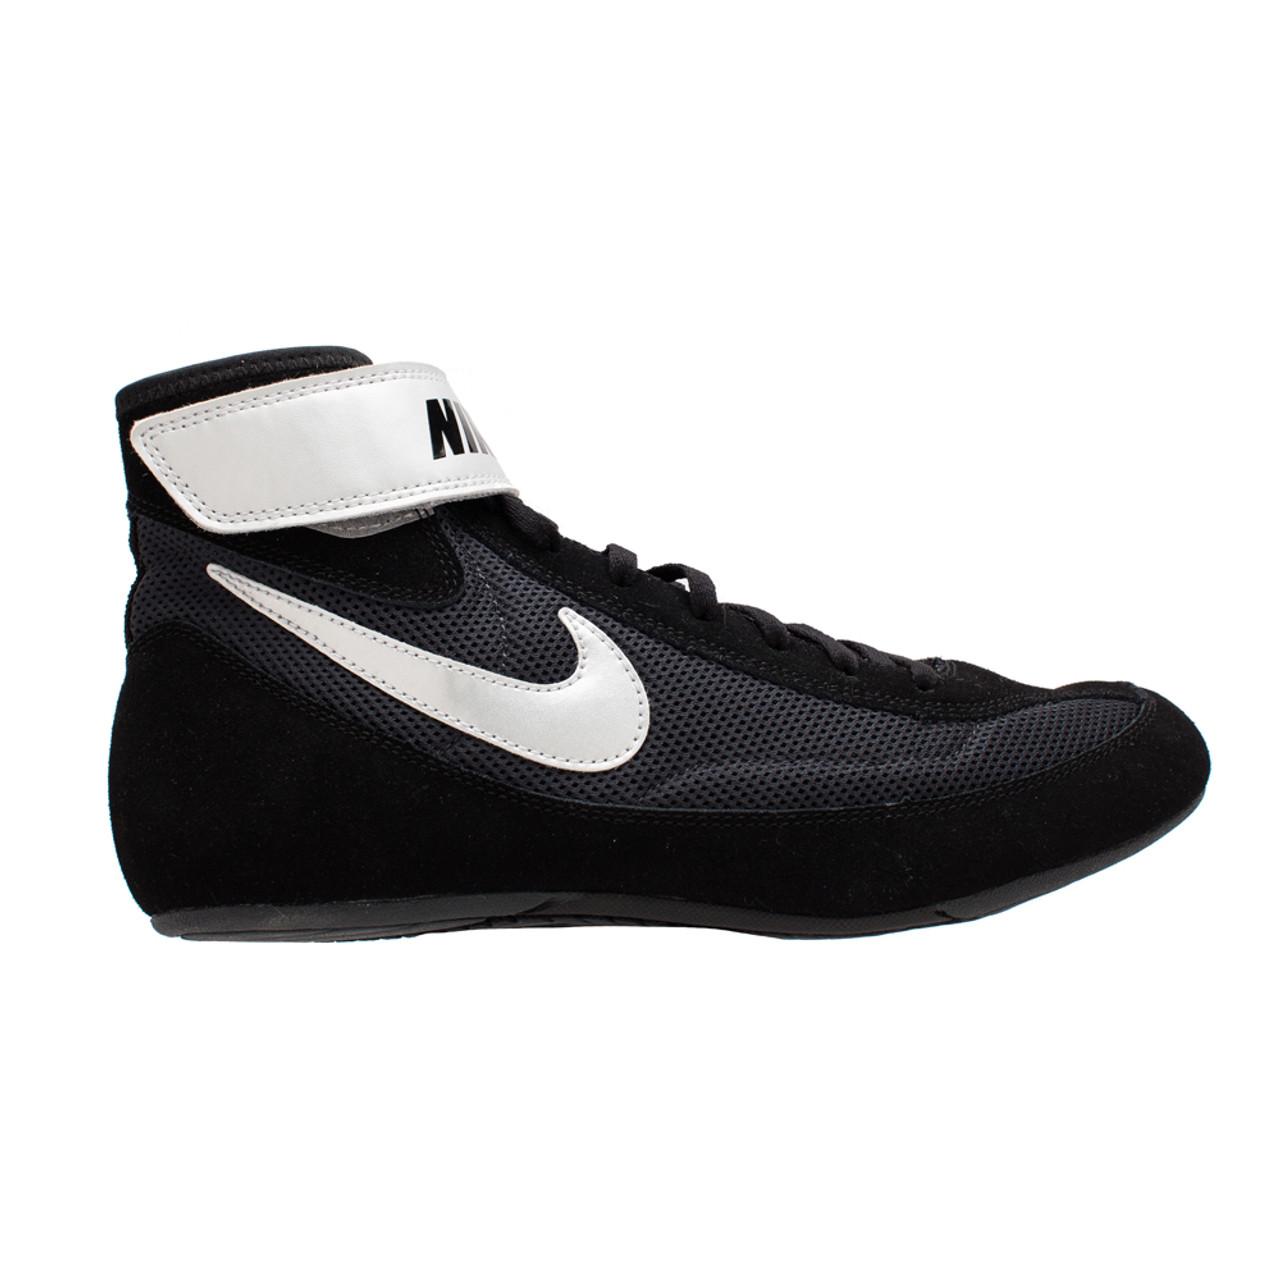 36871a9963a0e Nike Speedsweep VII - Black/Metallic Silver